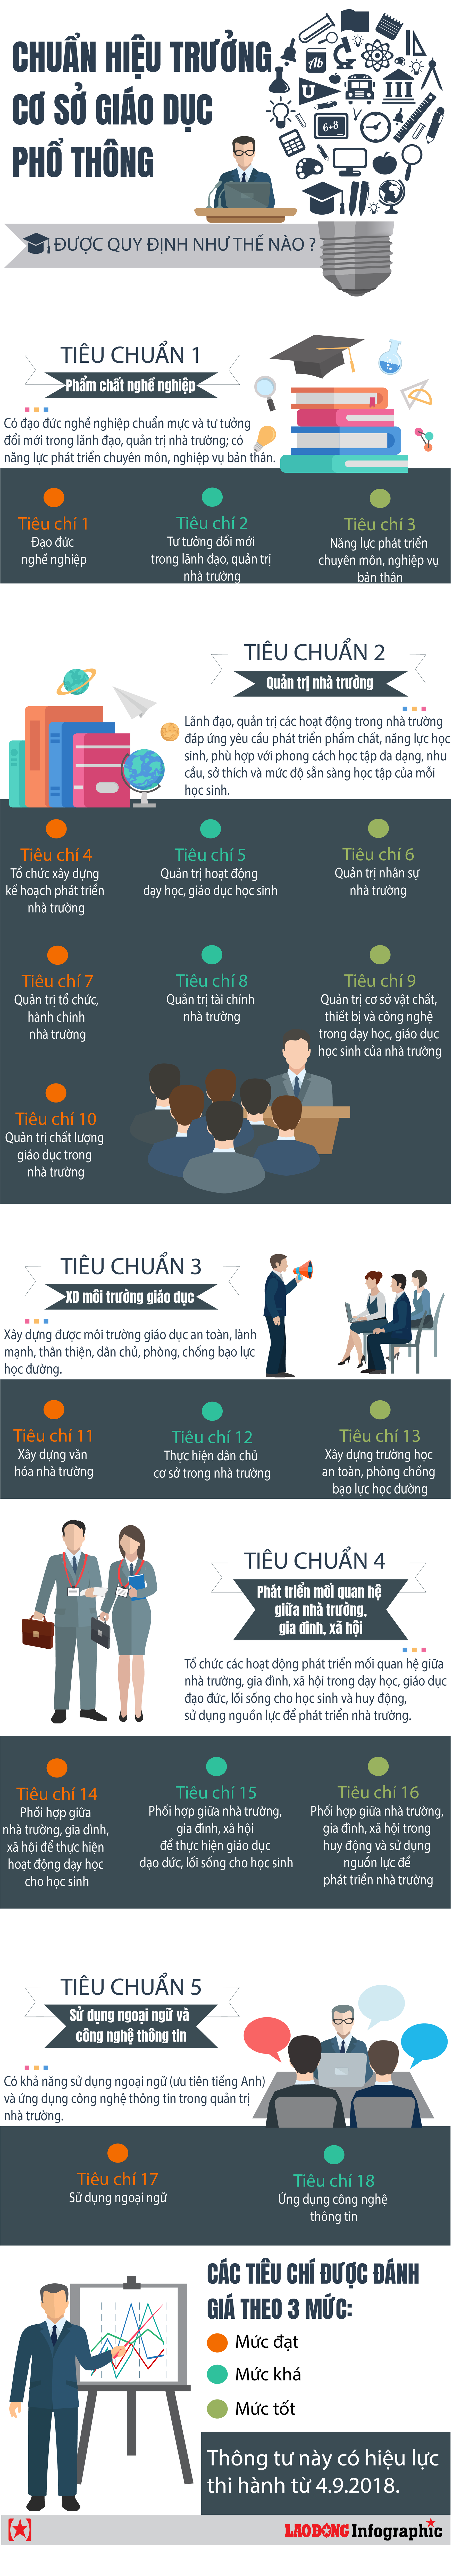 infographic muon tro thanh hieu truong phai dap ung nhung tieu chuan khat khe nao